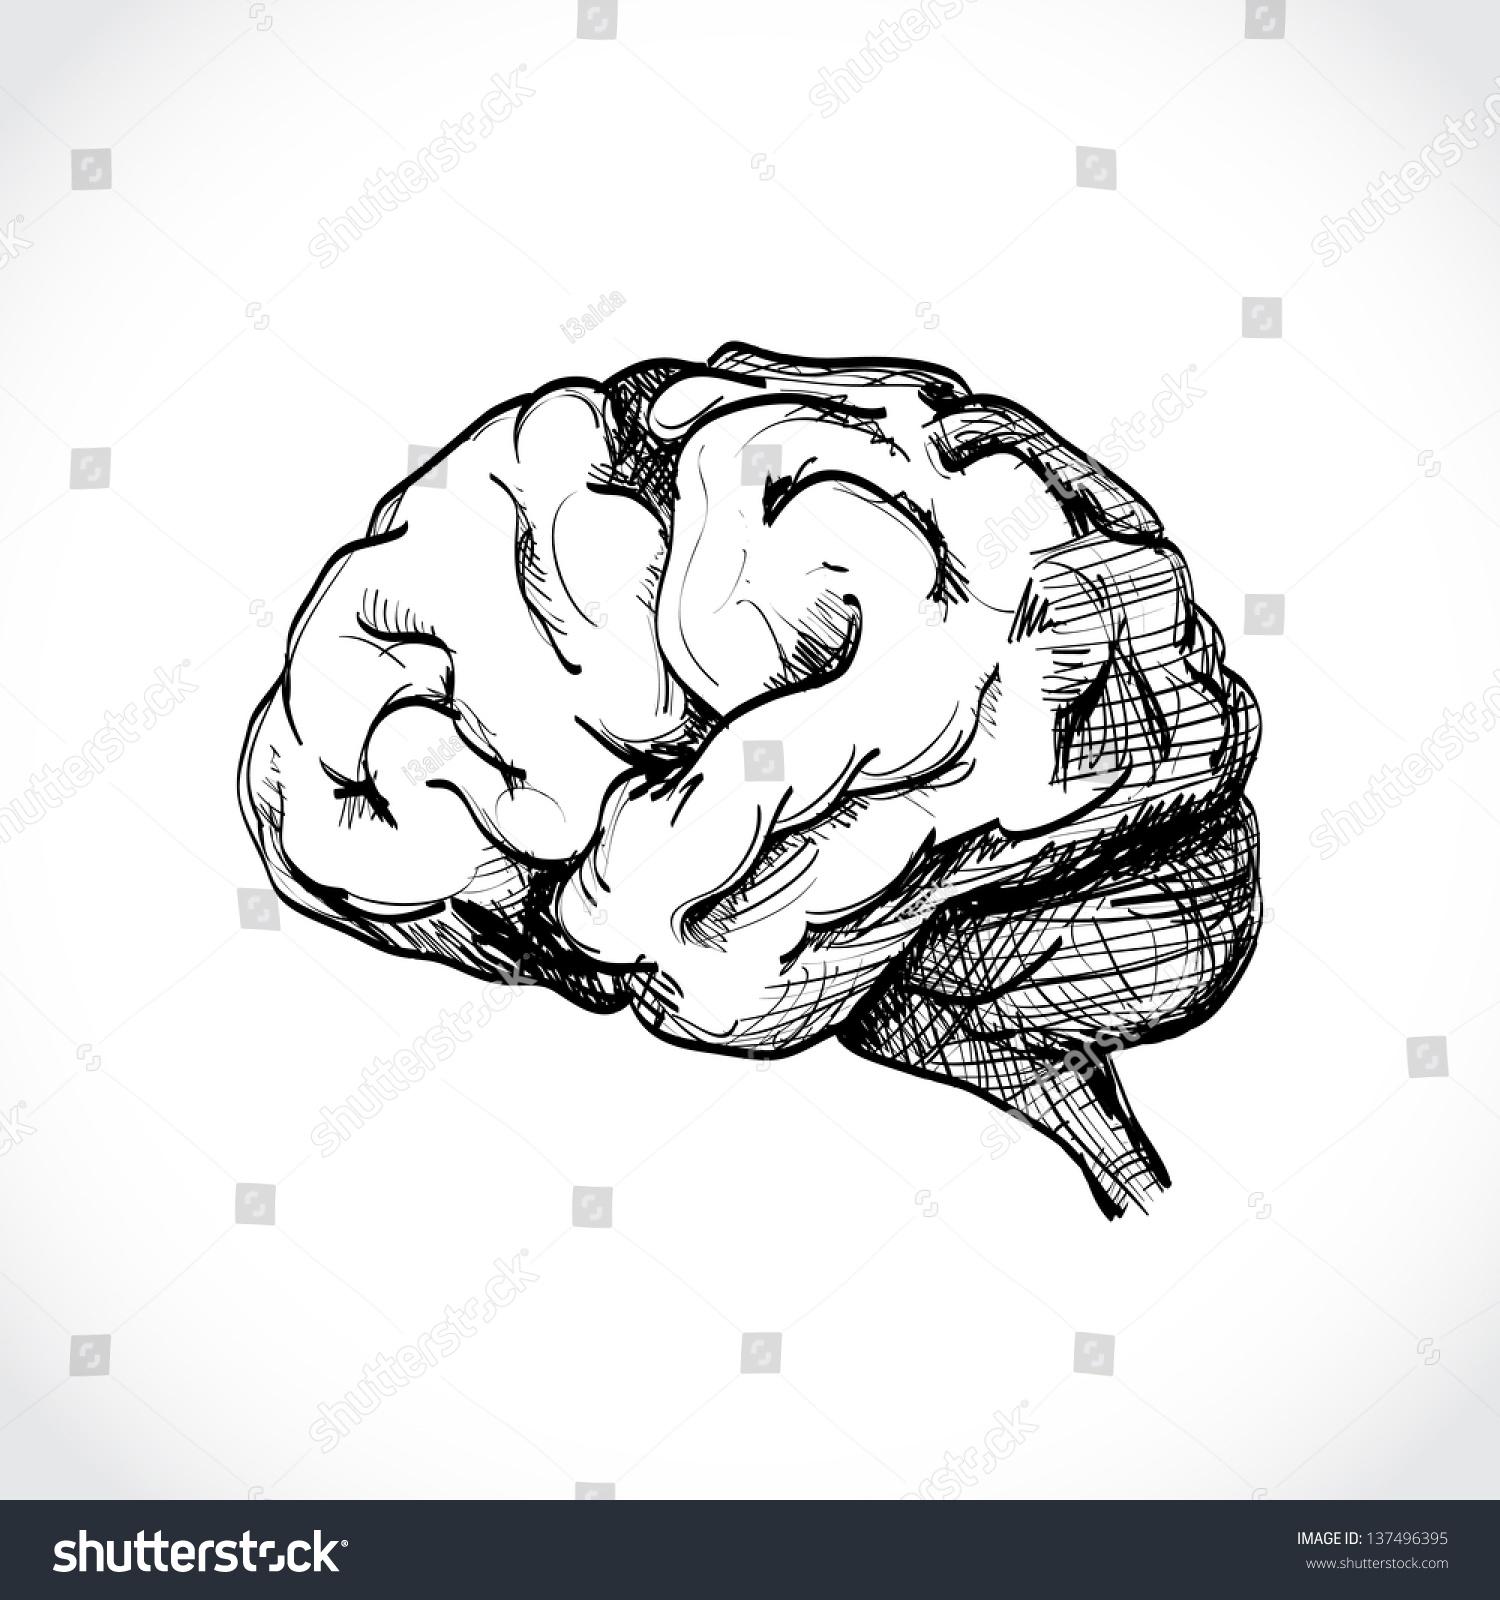 Isolated Human Brain Sketch Illustration Stock Vector 137496395 - Shutterstock